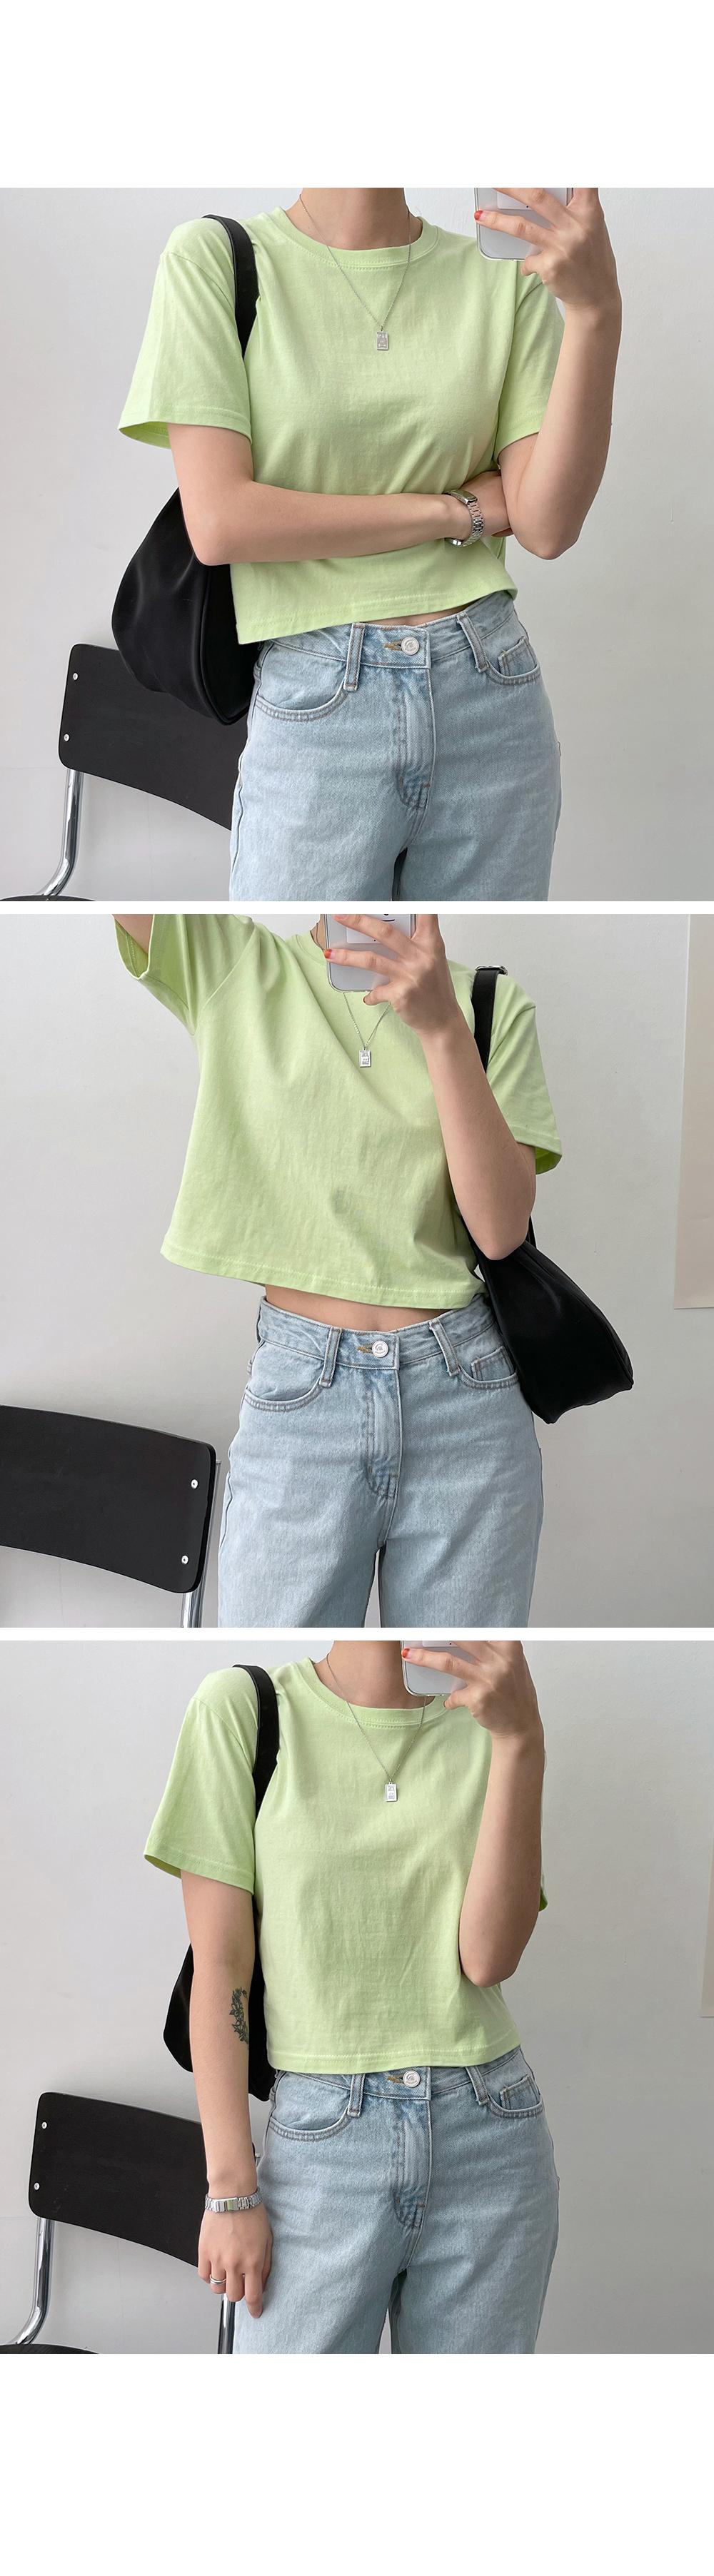 dress product image-S1L22